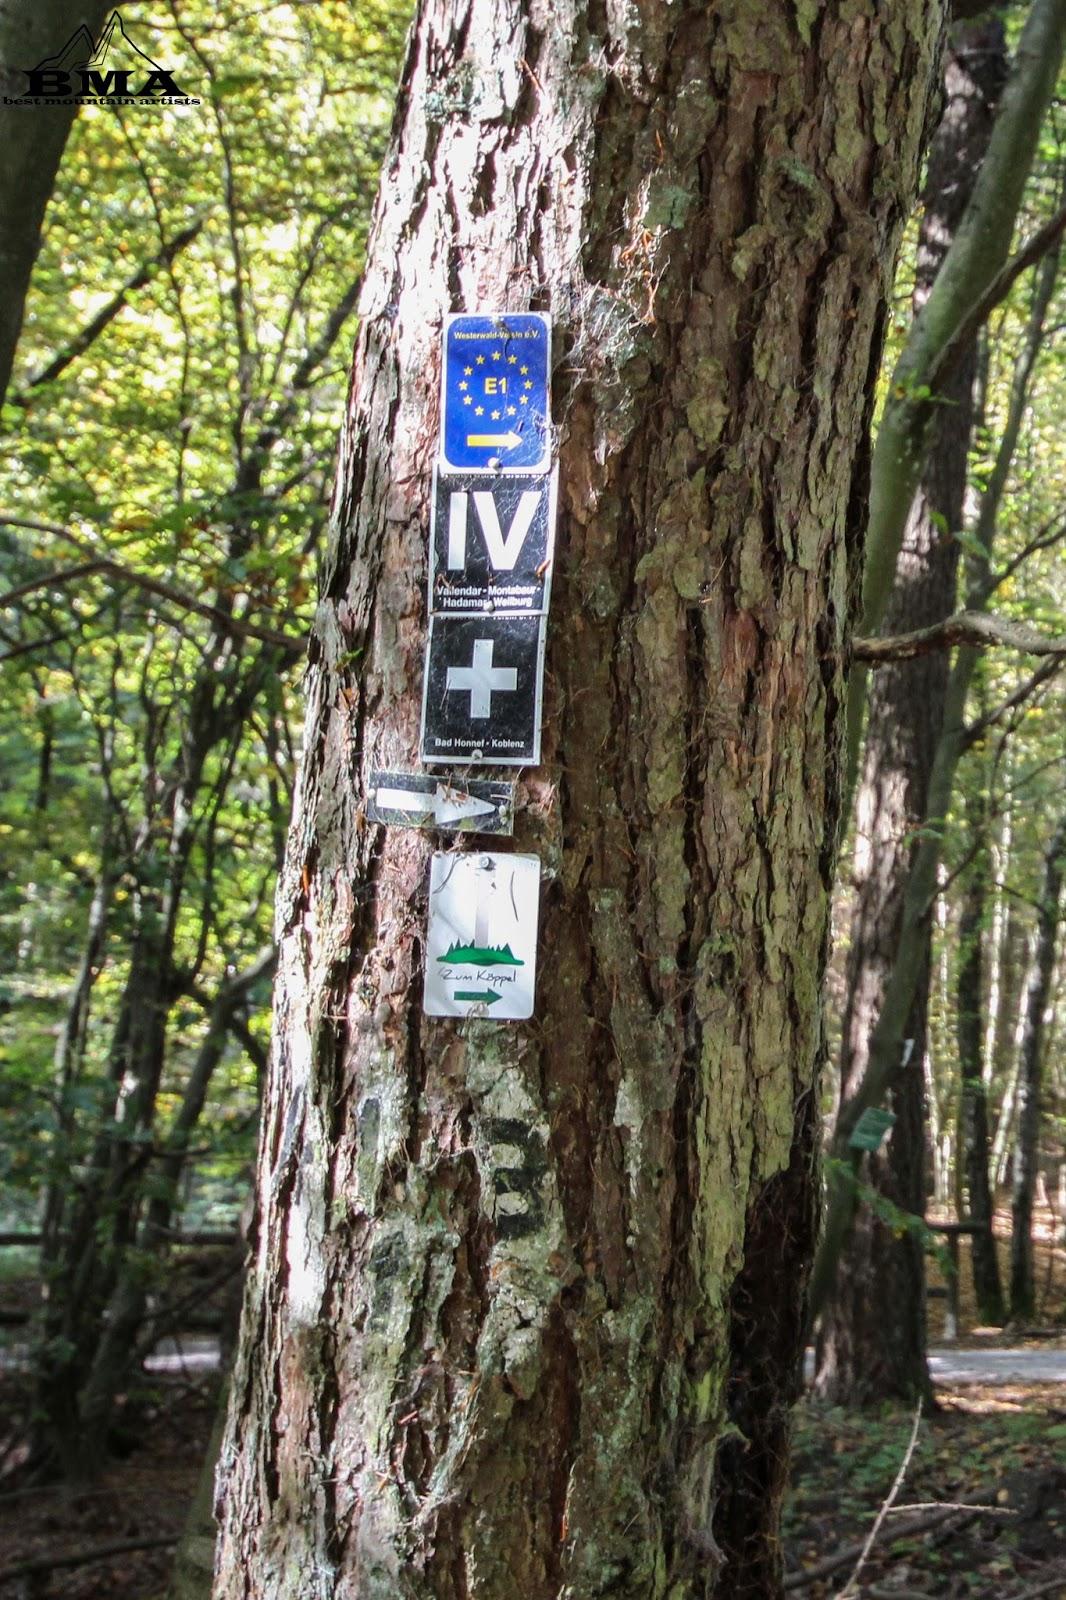 wandern rheinland-pfalz - wanderung montabaur - köppel - outdoor blog best mountain artists